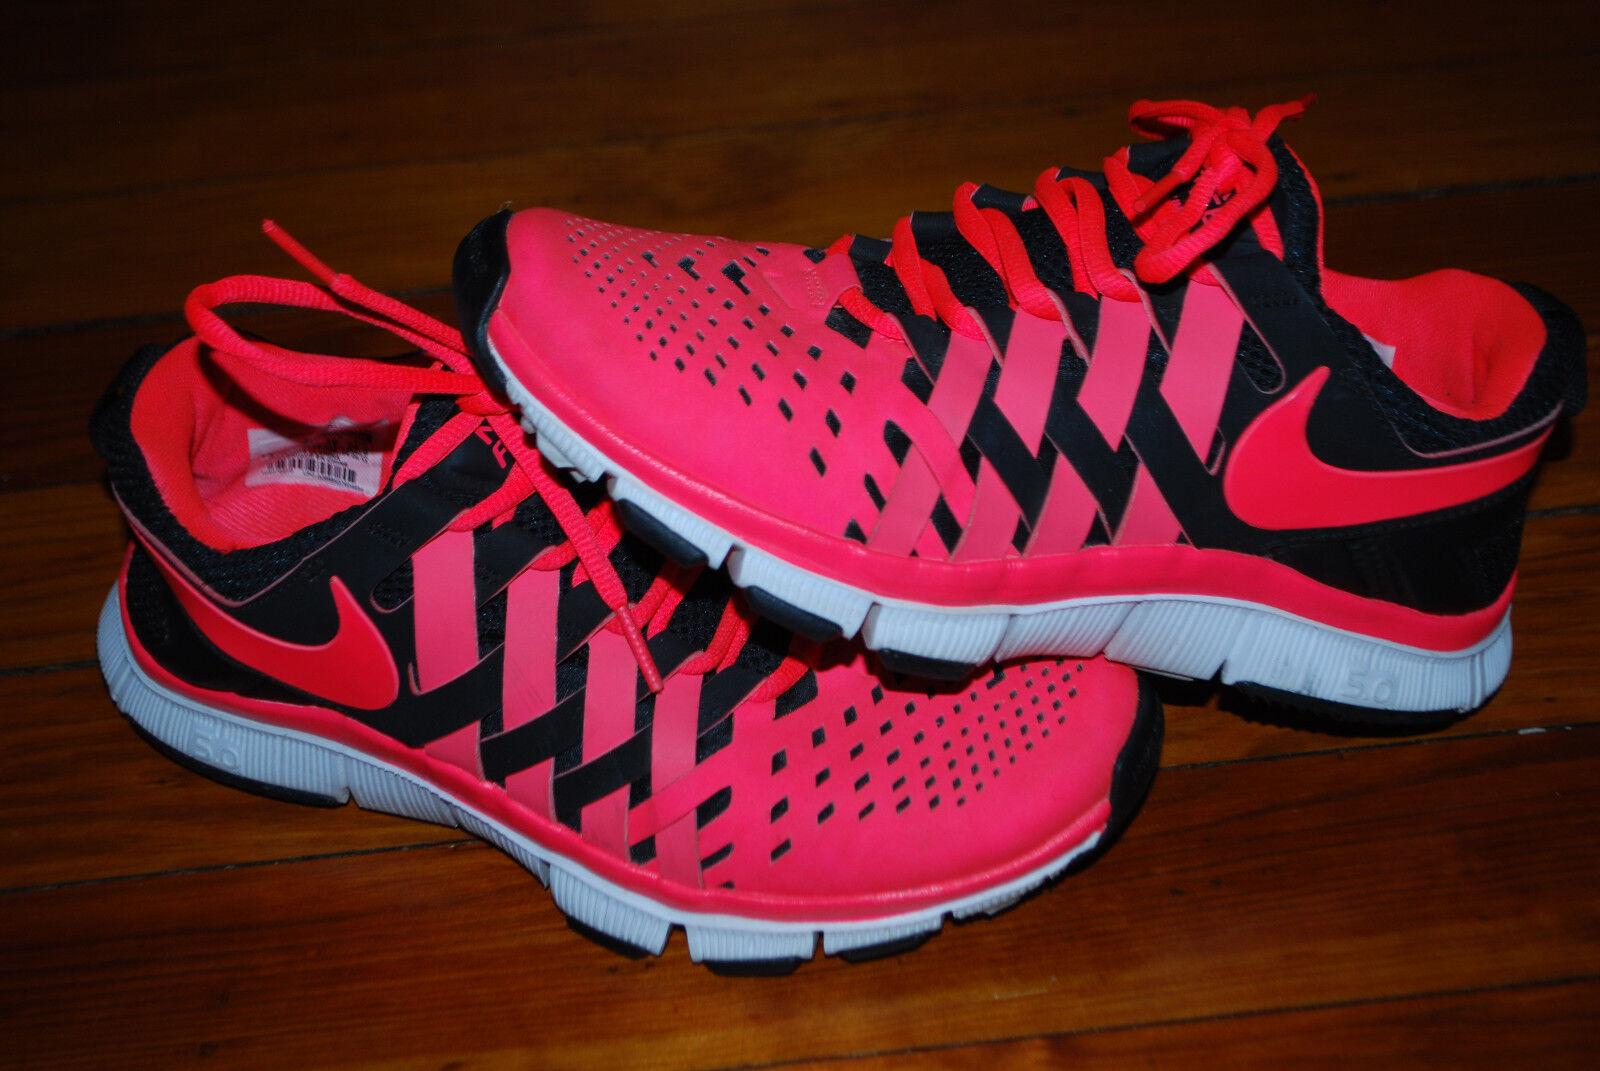 super popular 0ccf0 31e49 Men s Nike Free Trainer 5 0 Weave Sneakers (6.5) White   Black   Atomic